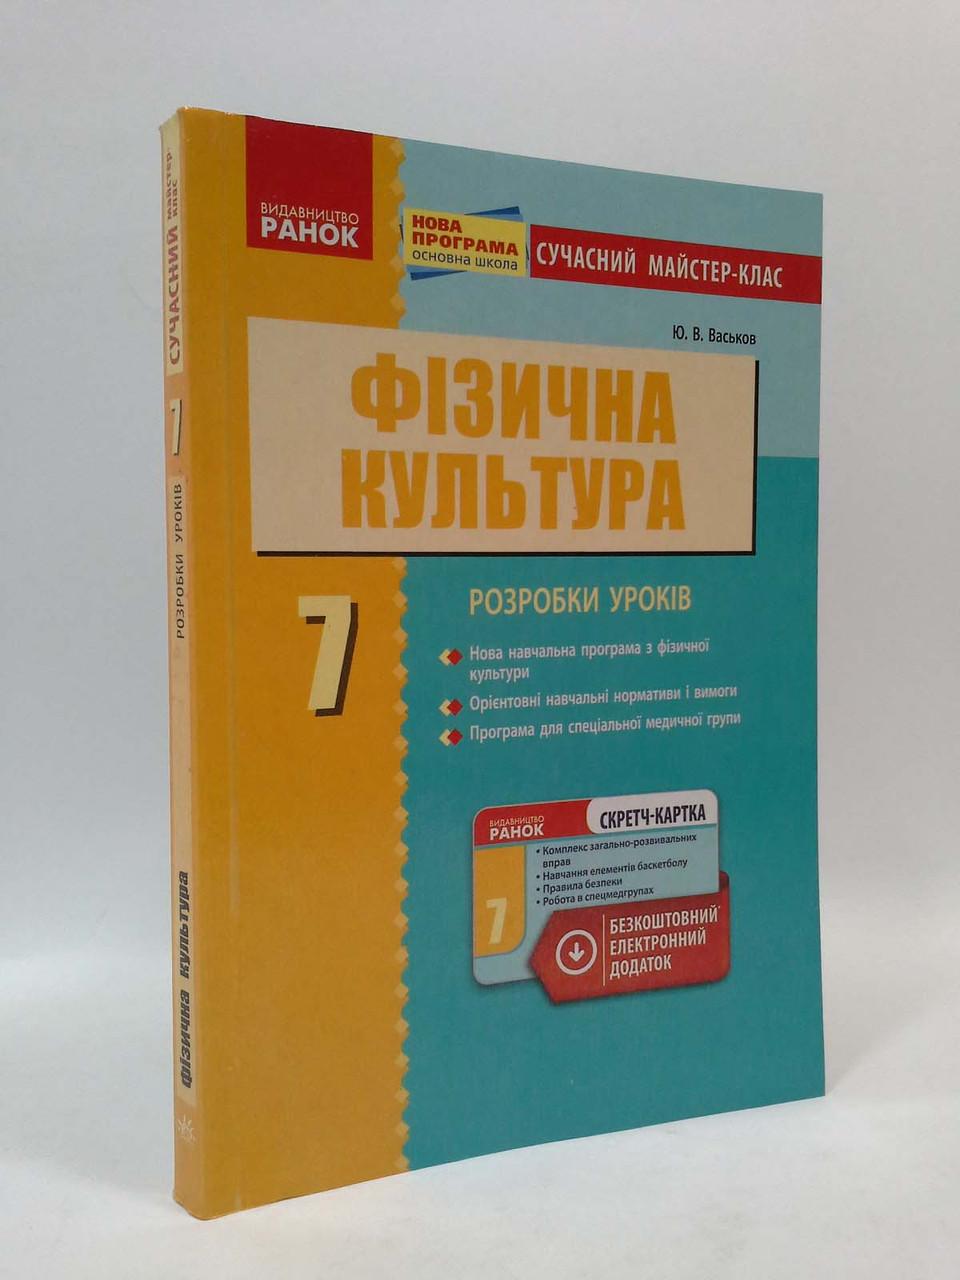 7 клас Ранок Фізична культура 7 клас Васьков